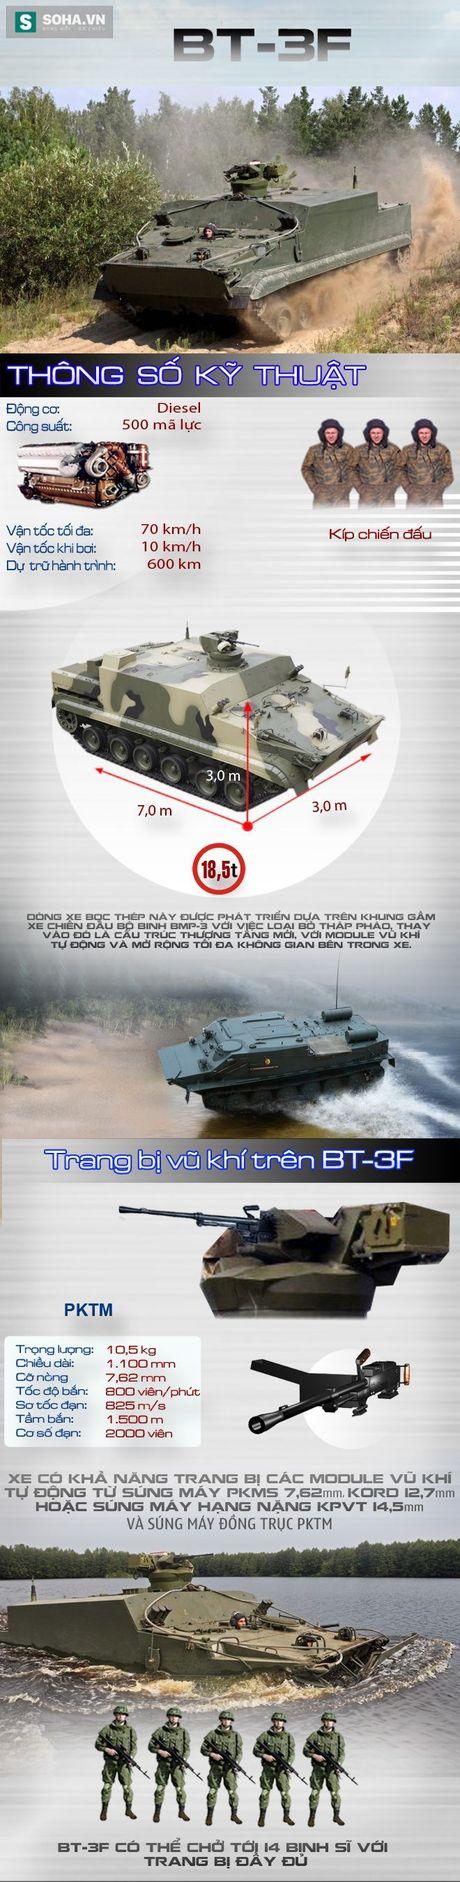 Ung vien so 1 cho vi tri xe thiet giap thay the BTR-50 - Anh 2